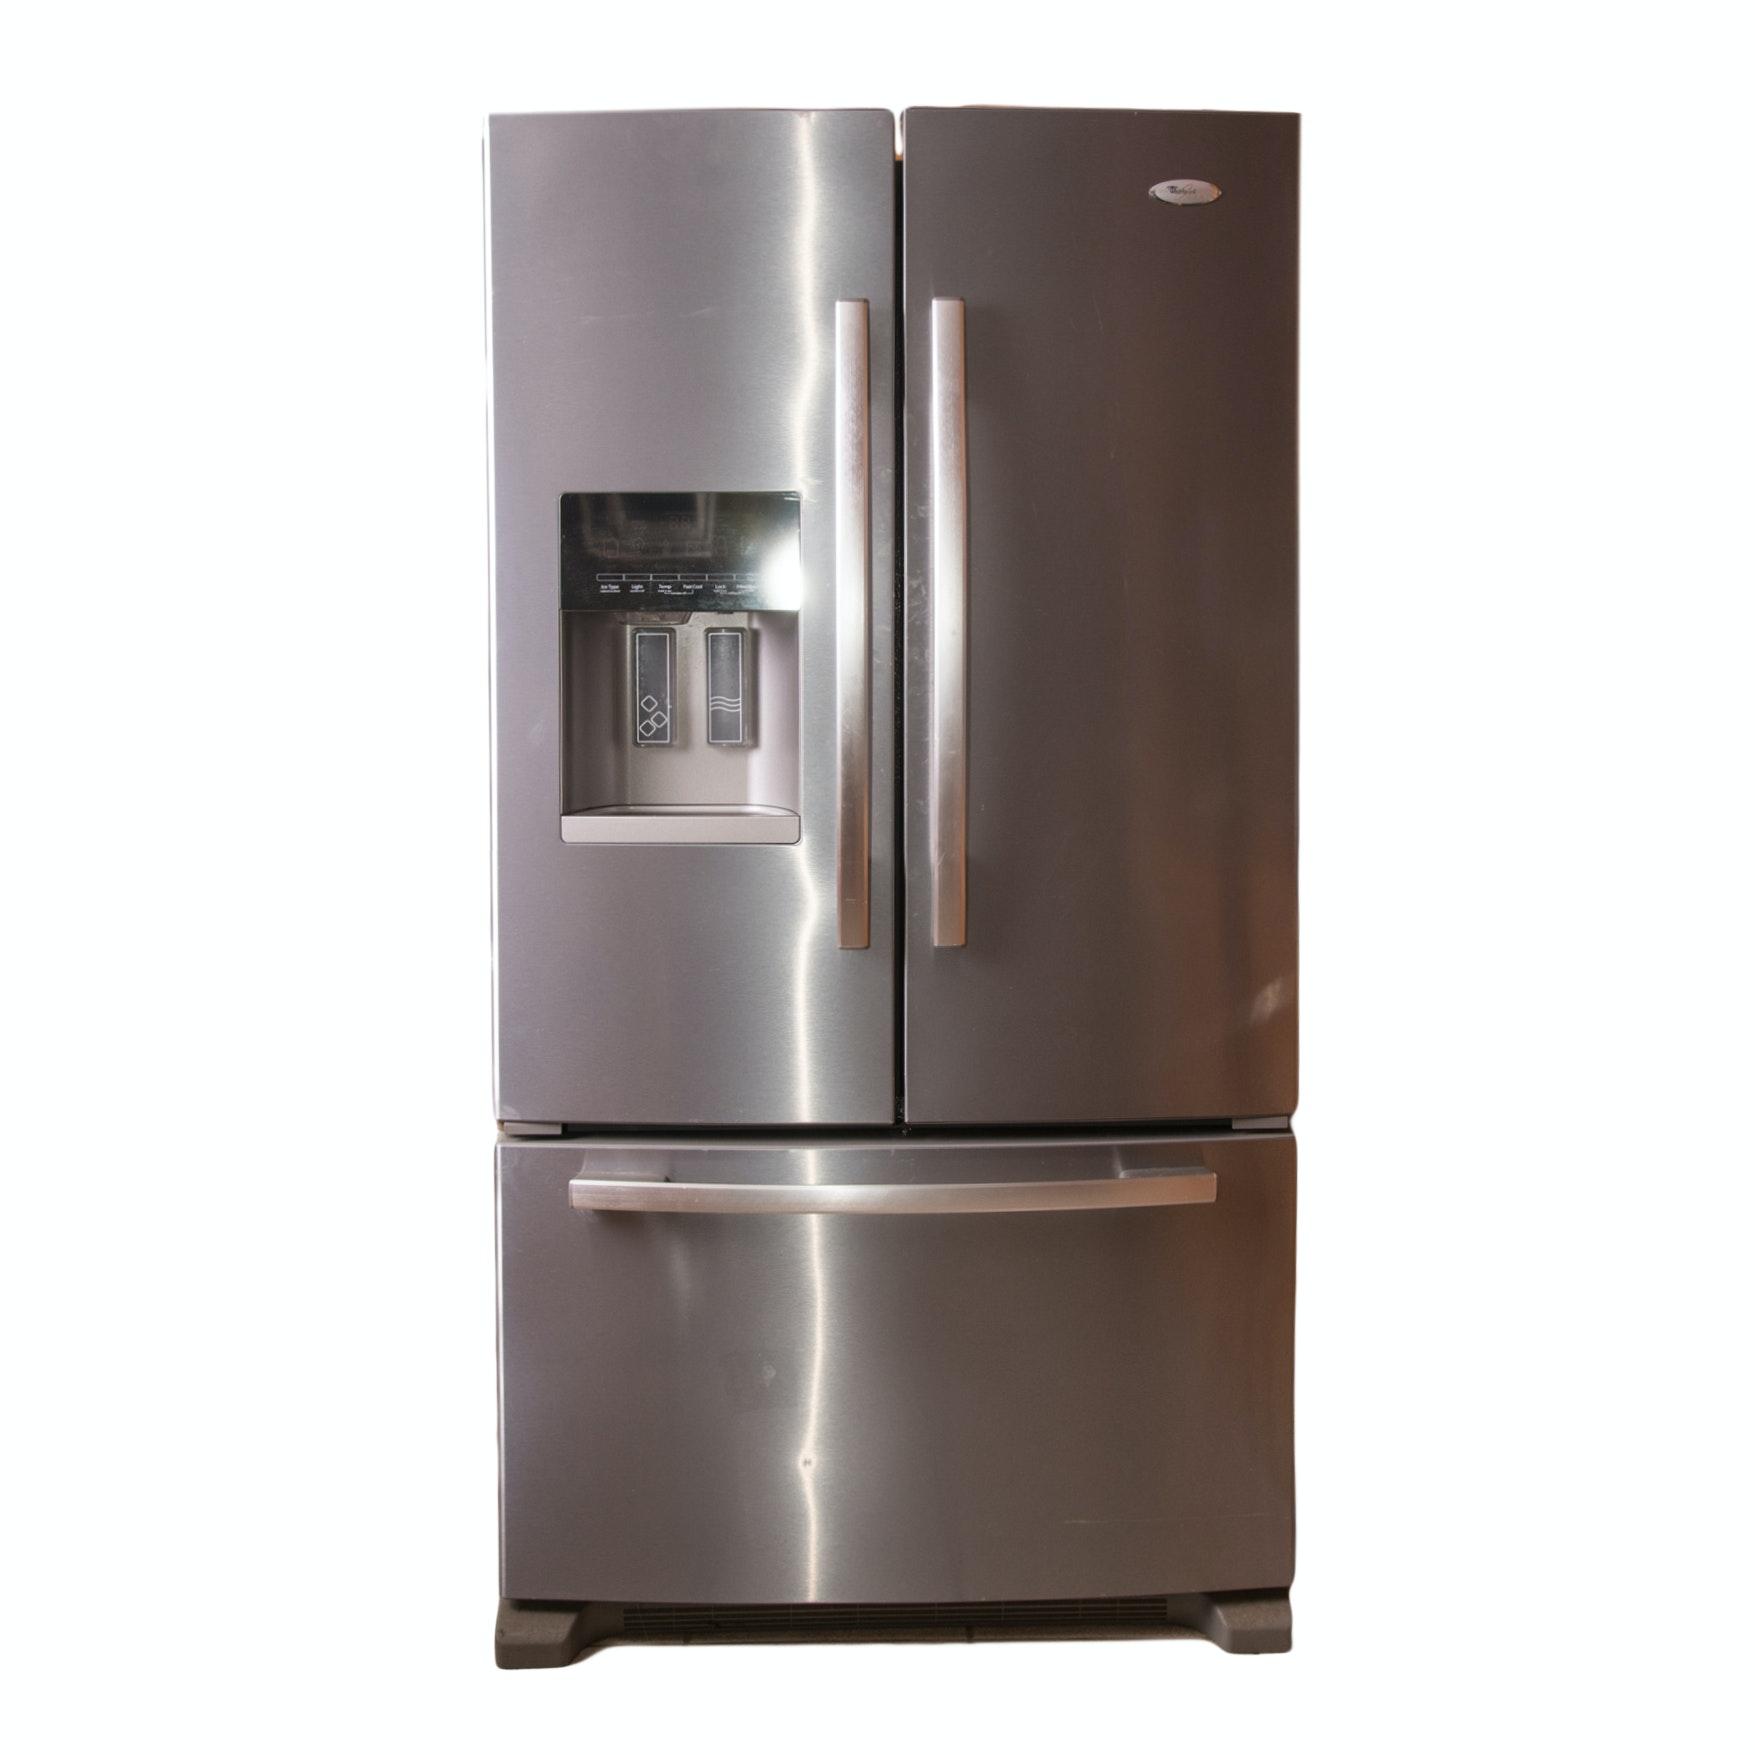 Whirlpool Gold Series French Door Refrigerator Ebth